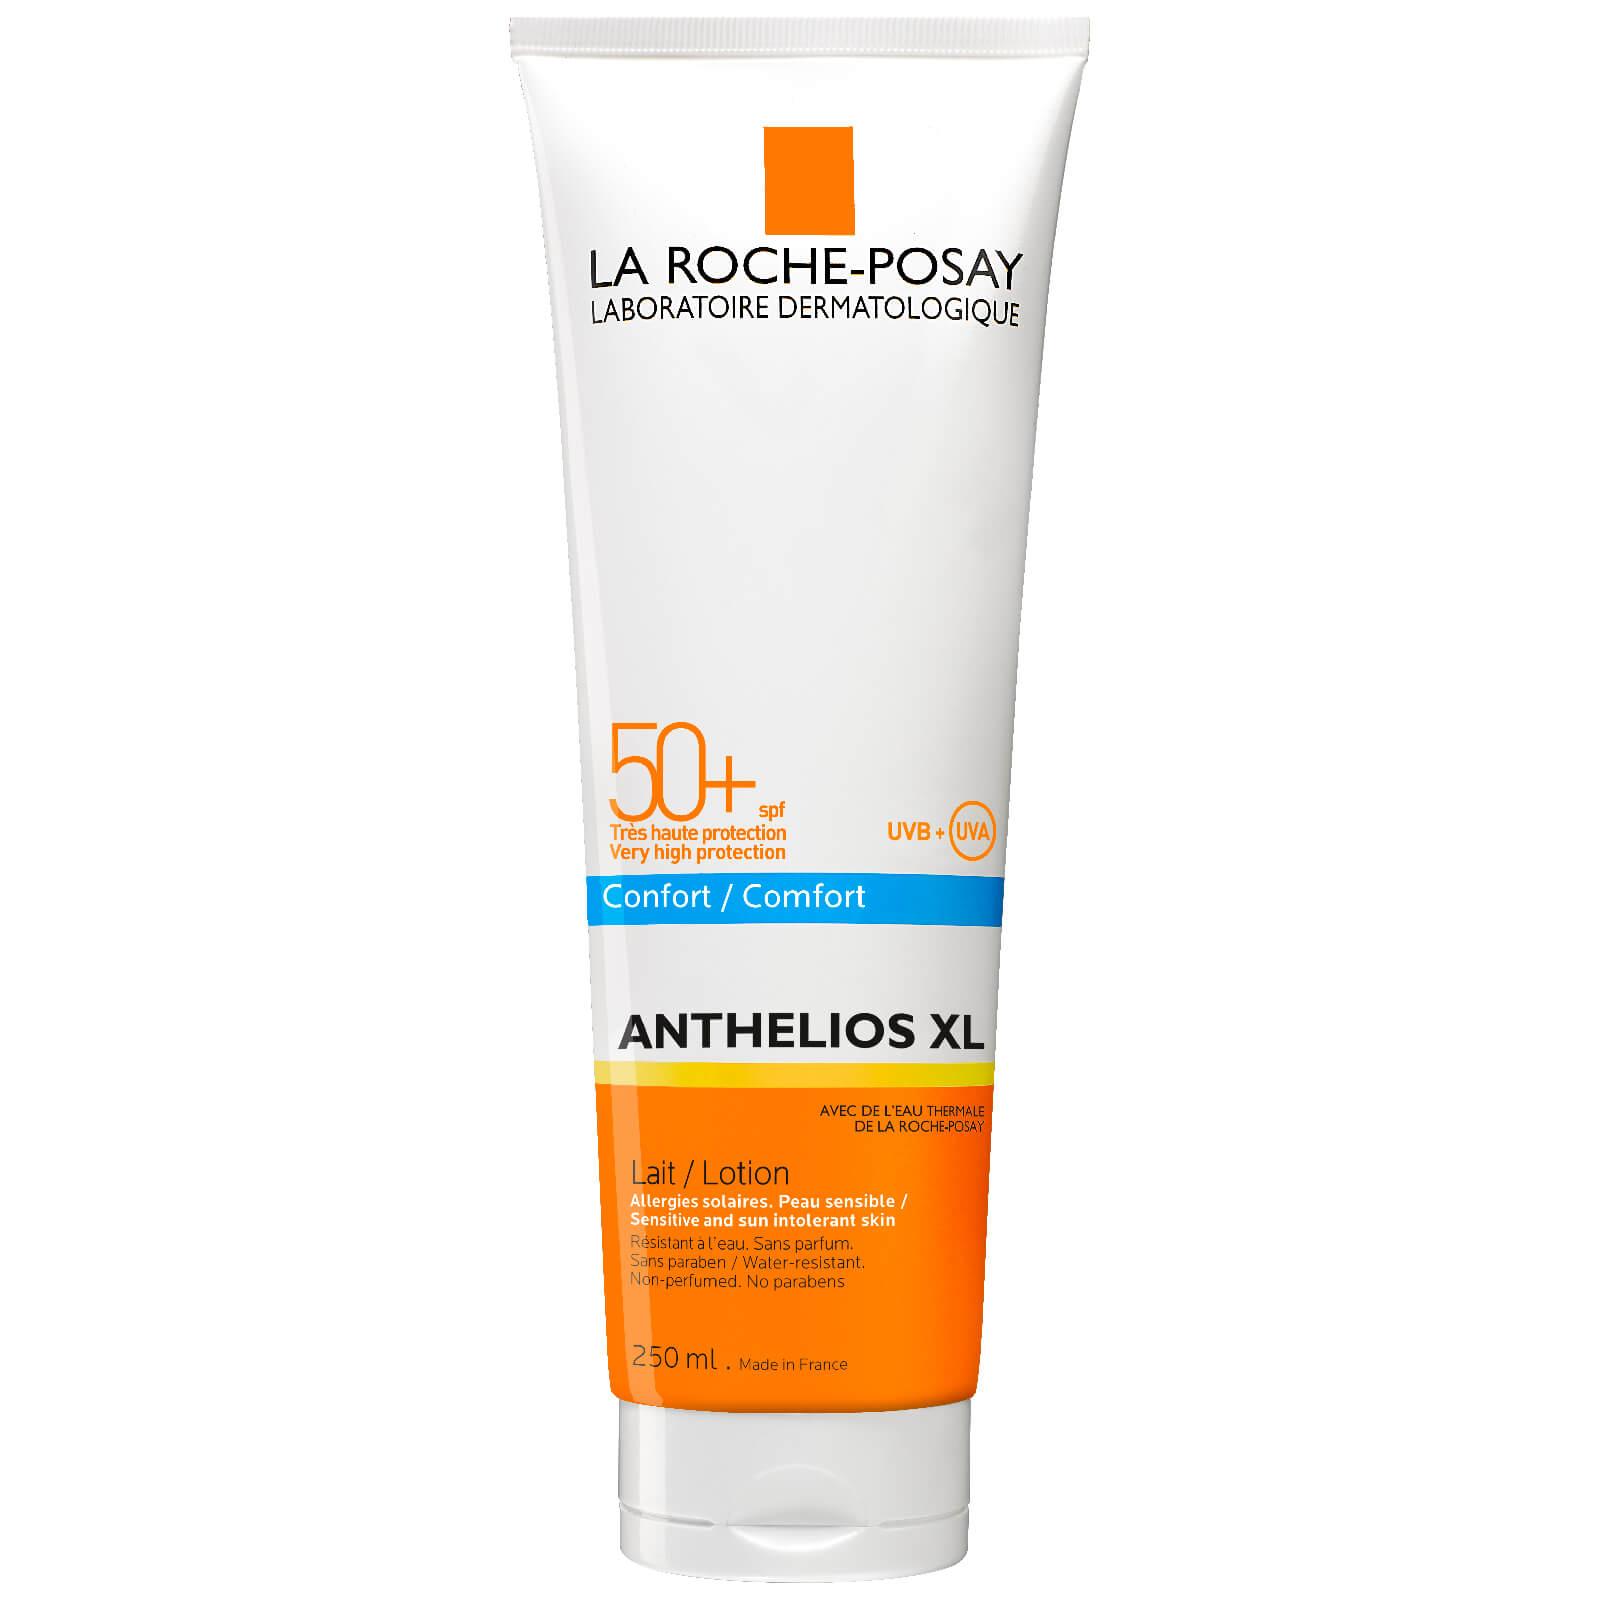 La Roche-Posay Lait Solaire Anthélios SPF 50+ 250 ml La Roche-Posay